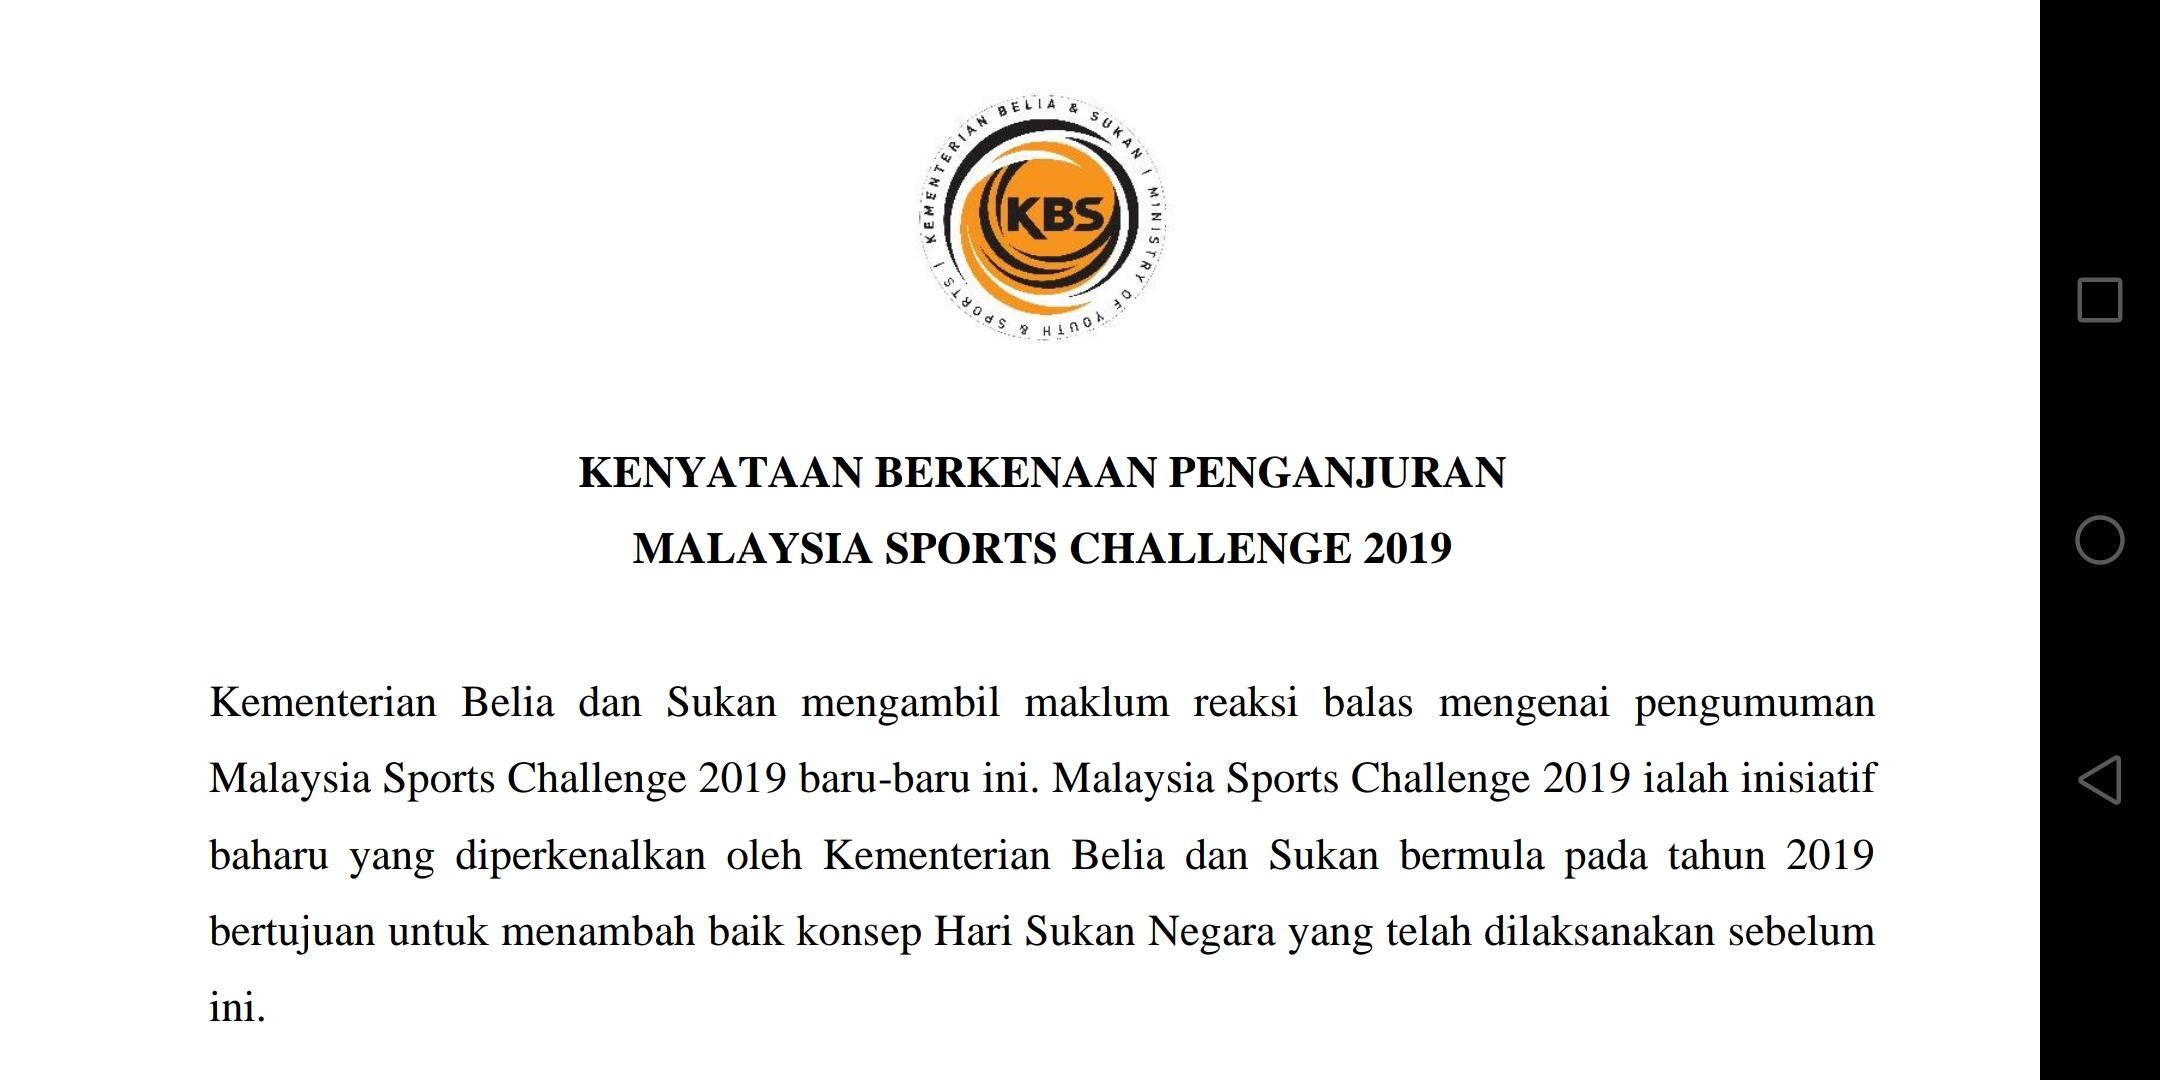 Kenyataan Kbs Berkenaan Penganjuran Malaysia Sports Challenge 2019